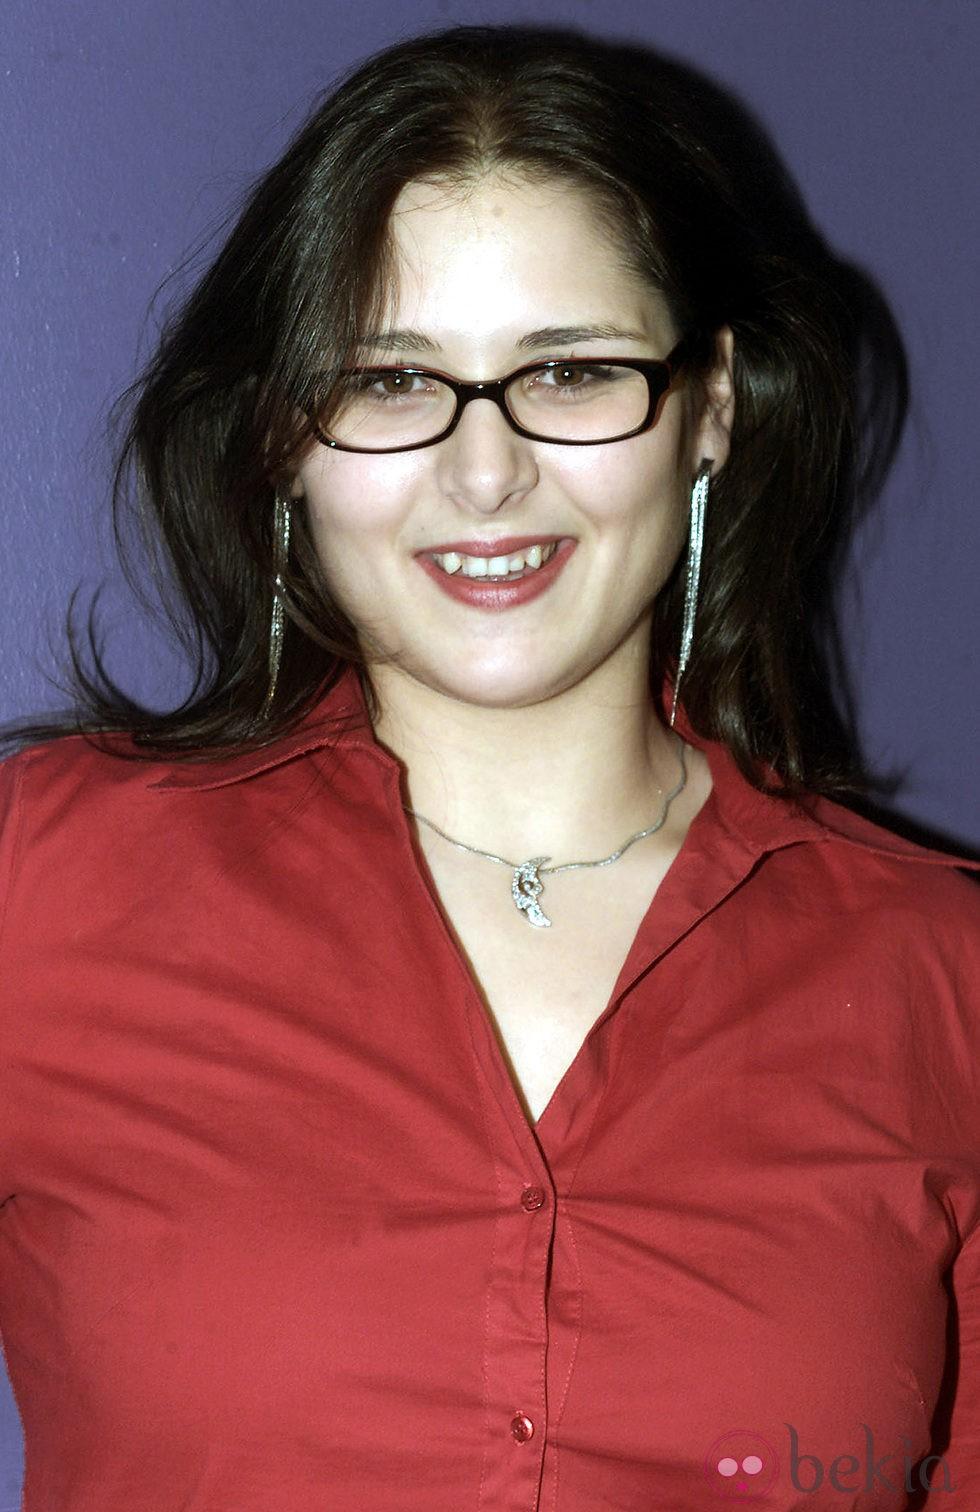 Rosa López antes de ponerse brackets